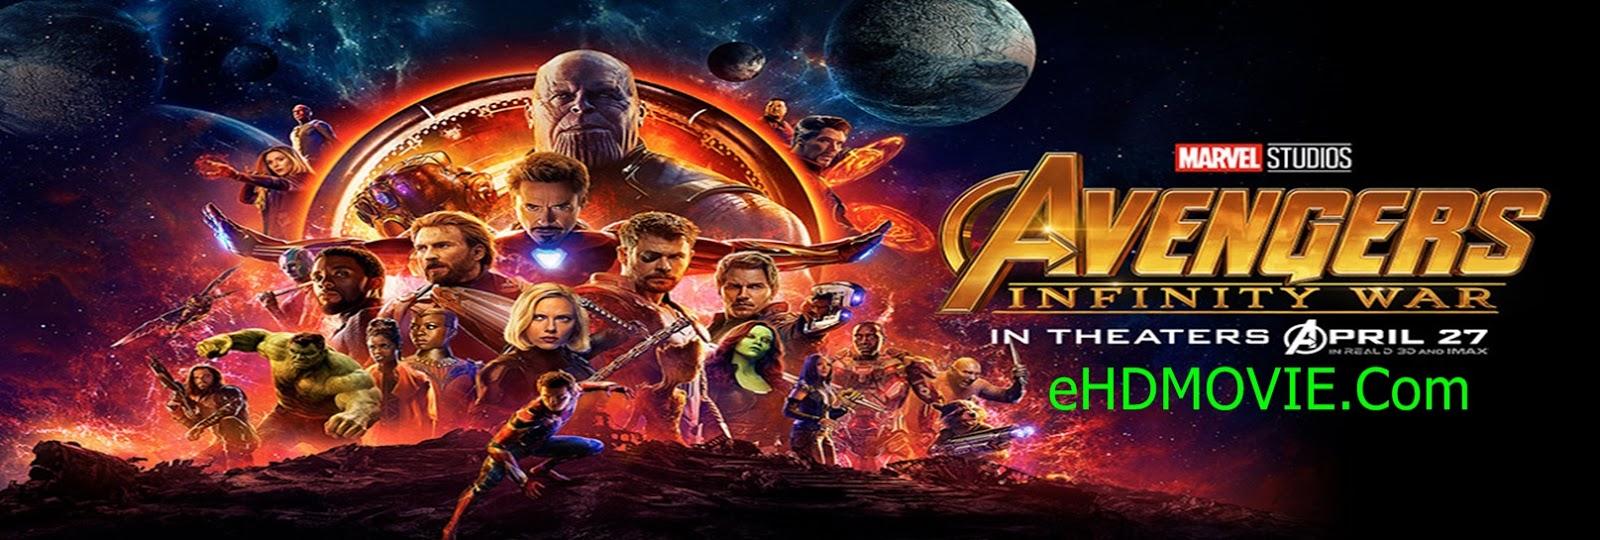 Avengers Infinity War 2018 Full Movie Dual Audio [Hindi – English] 720p - HEVC - 480p ORG WEB-DL 200MB - 500MB - 1.3GB - 2.2GB ESubs Free Download